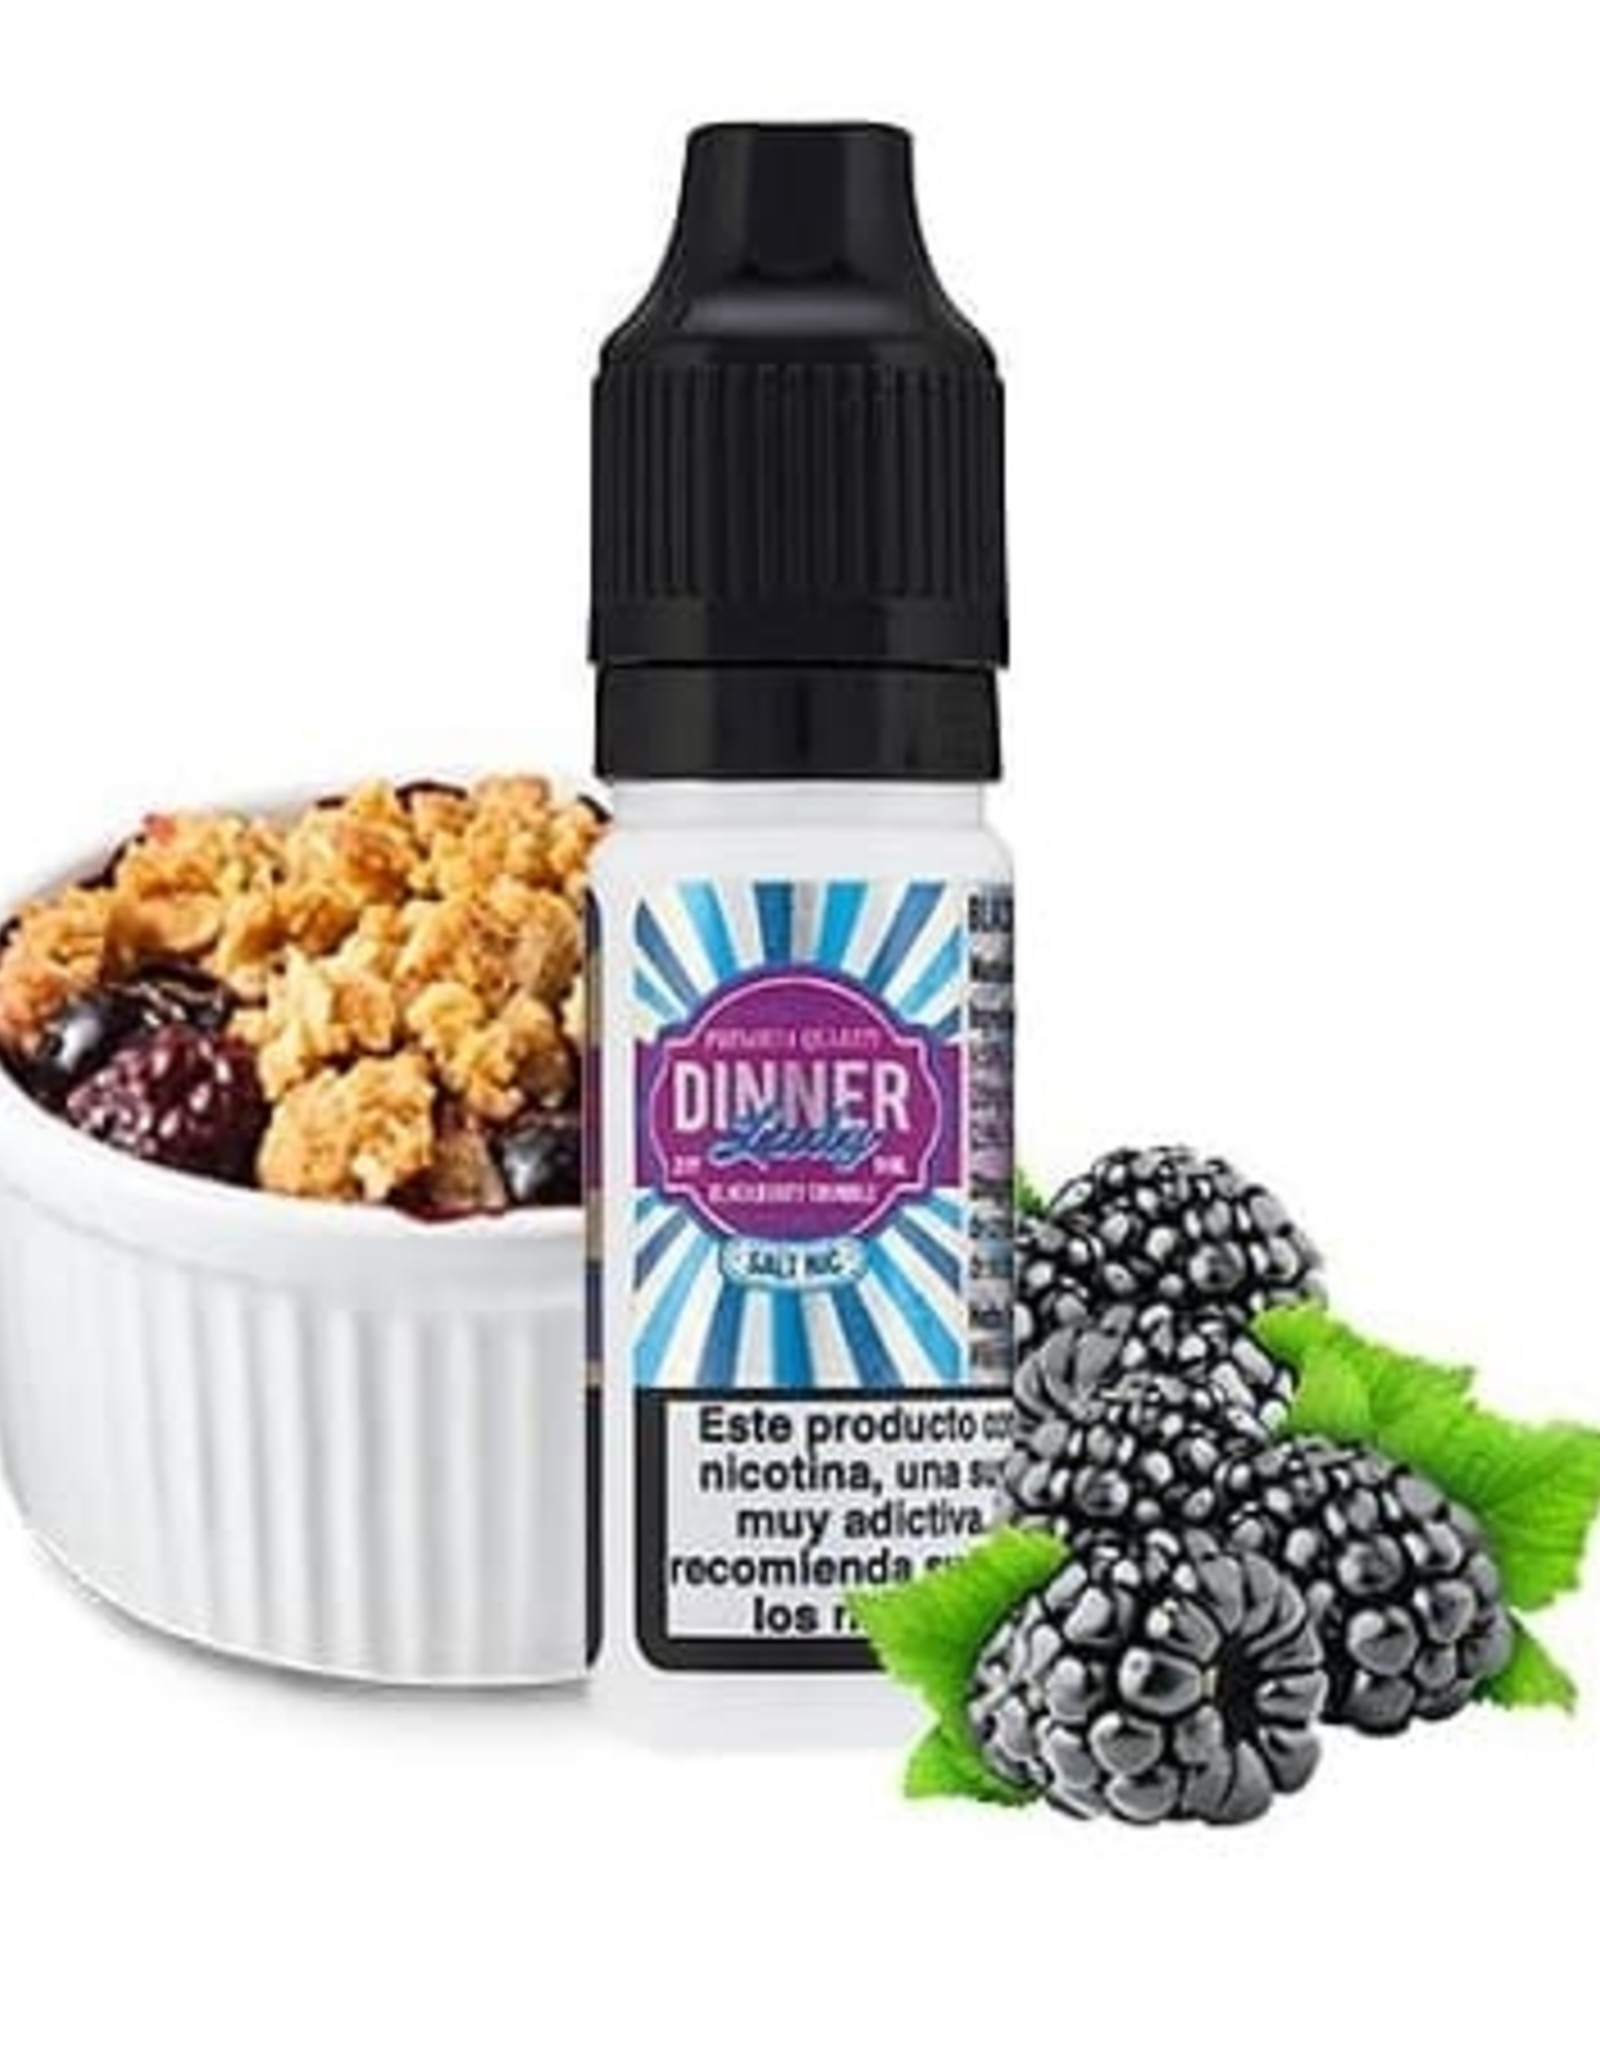 Dinner Lady Dinner Lady - Blackberry Crumble 10ml 20mg